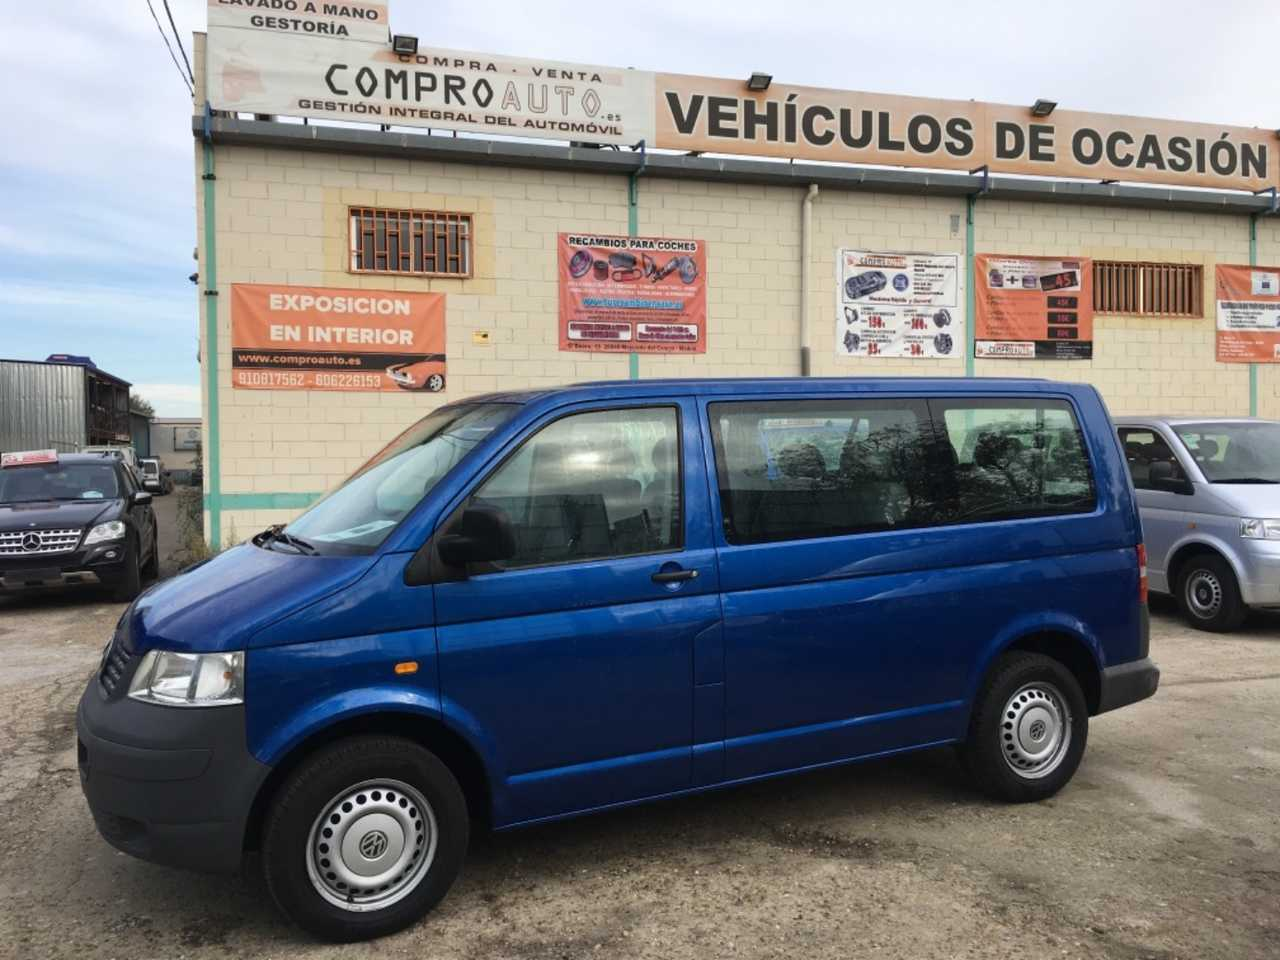 Volkswagen Transporter 1.9 Tdi 9  plazas   - Foto 1